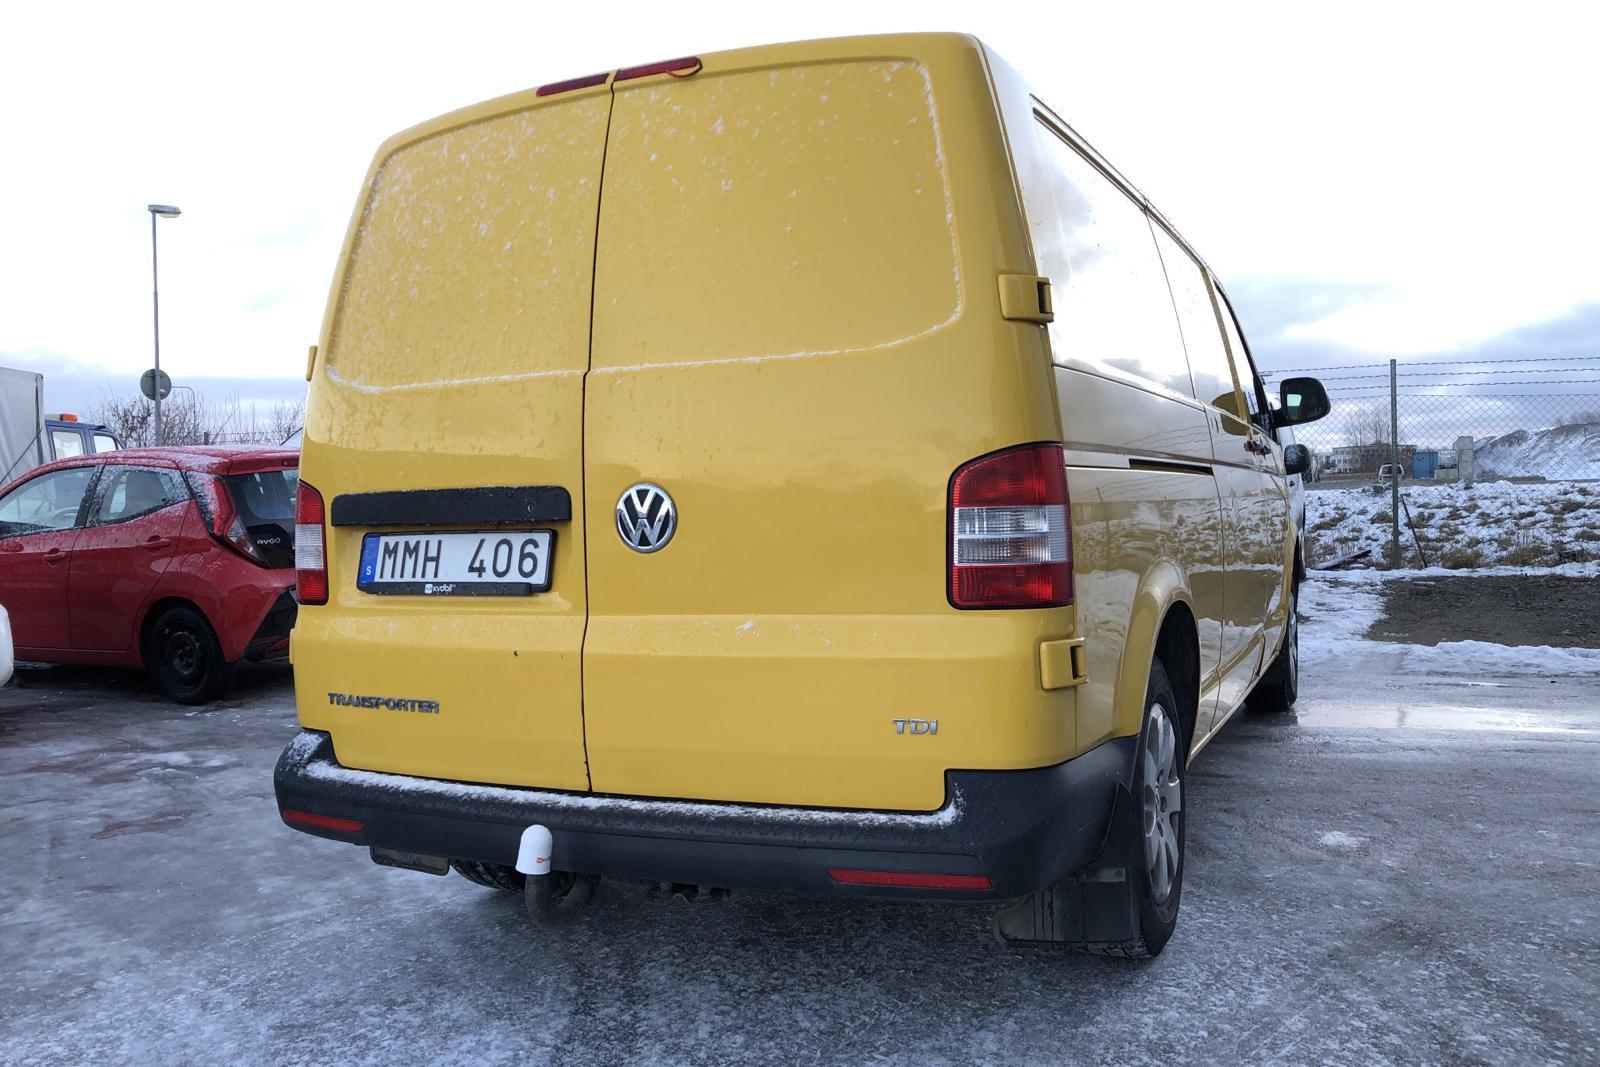 VW Transporter T5 2.0 TDI (102hk) - 205 450 km - Manual - yellow - 2014